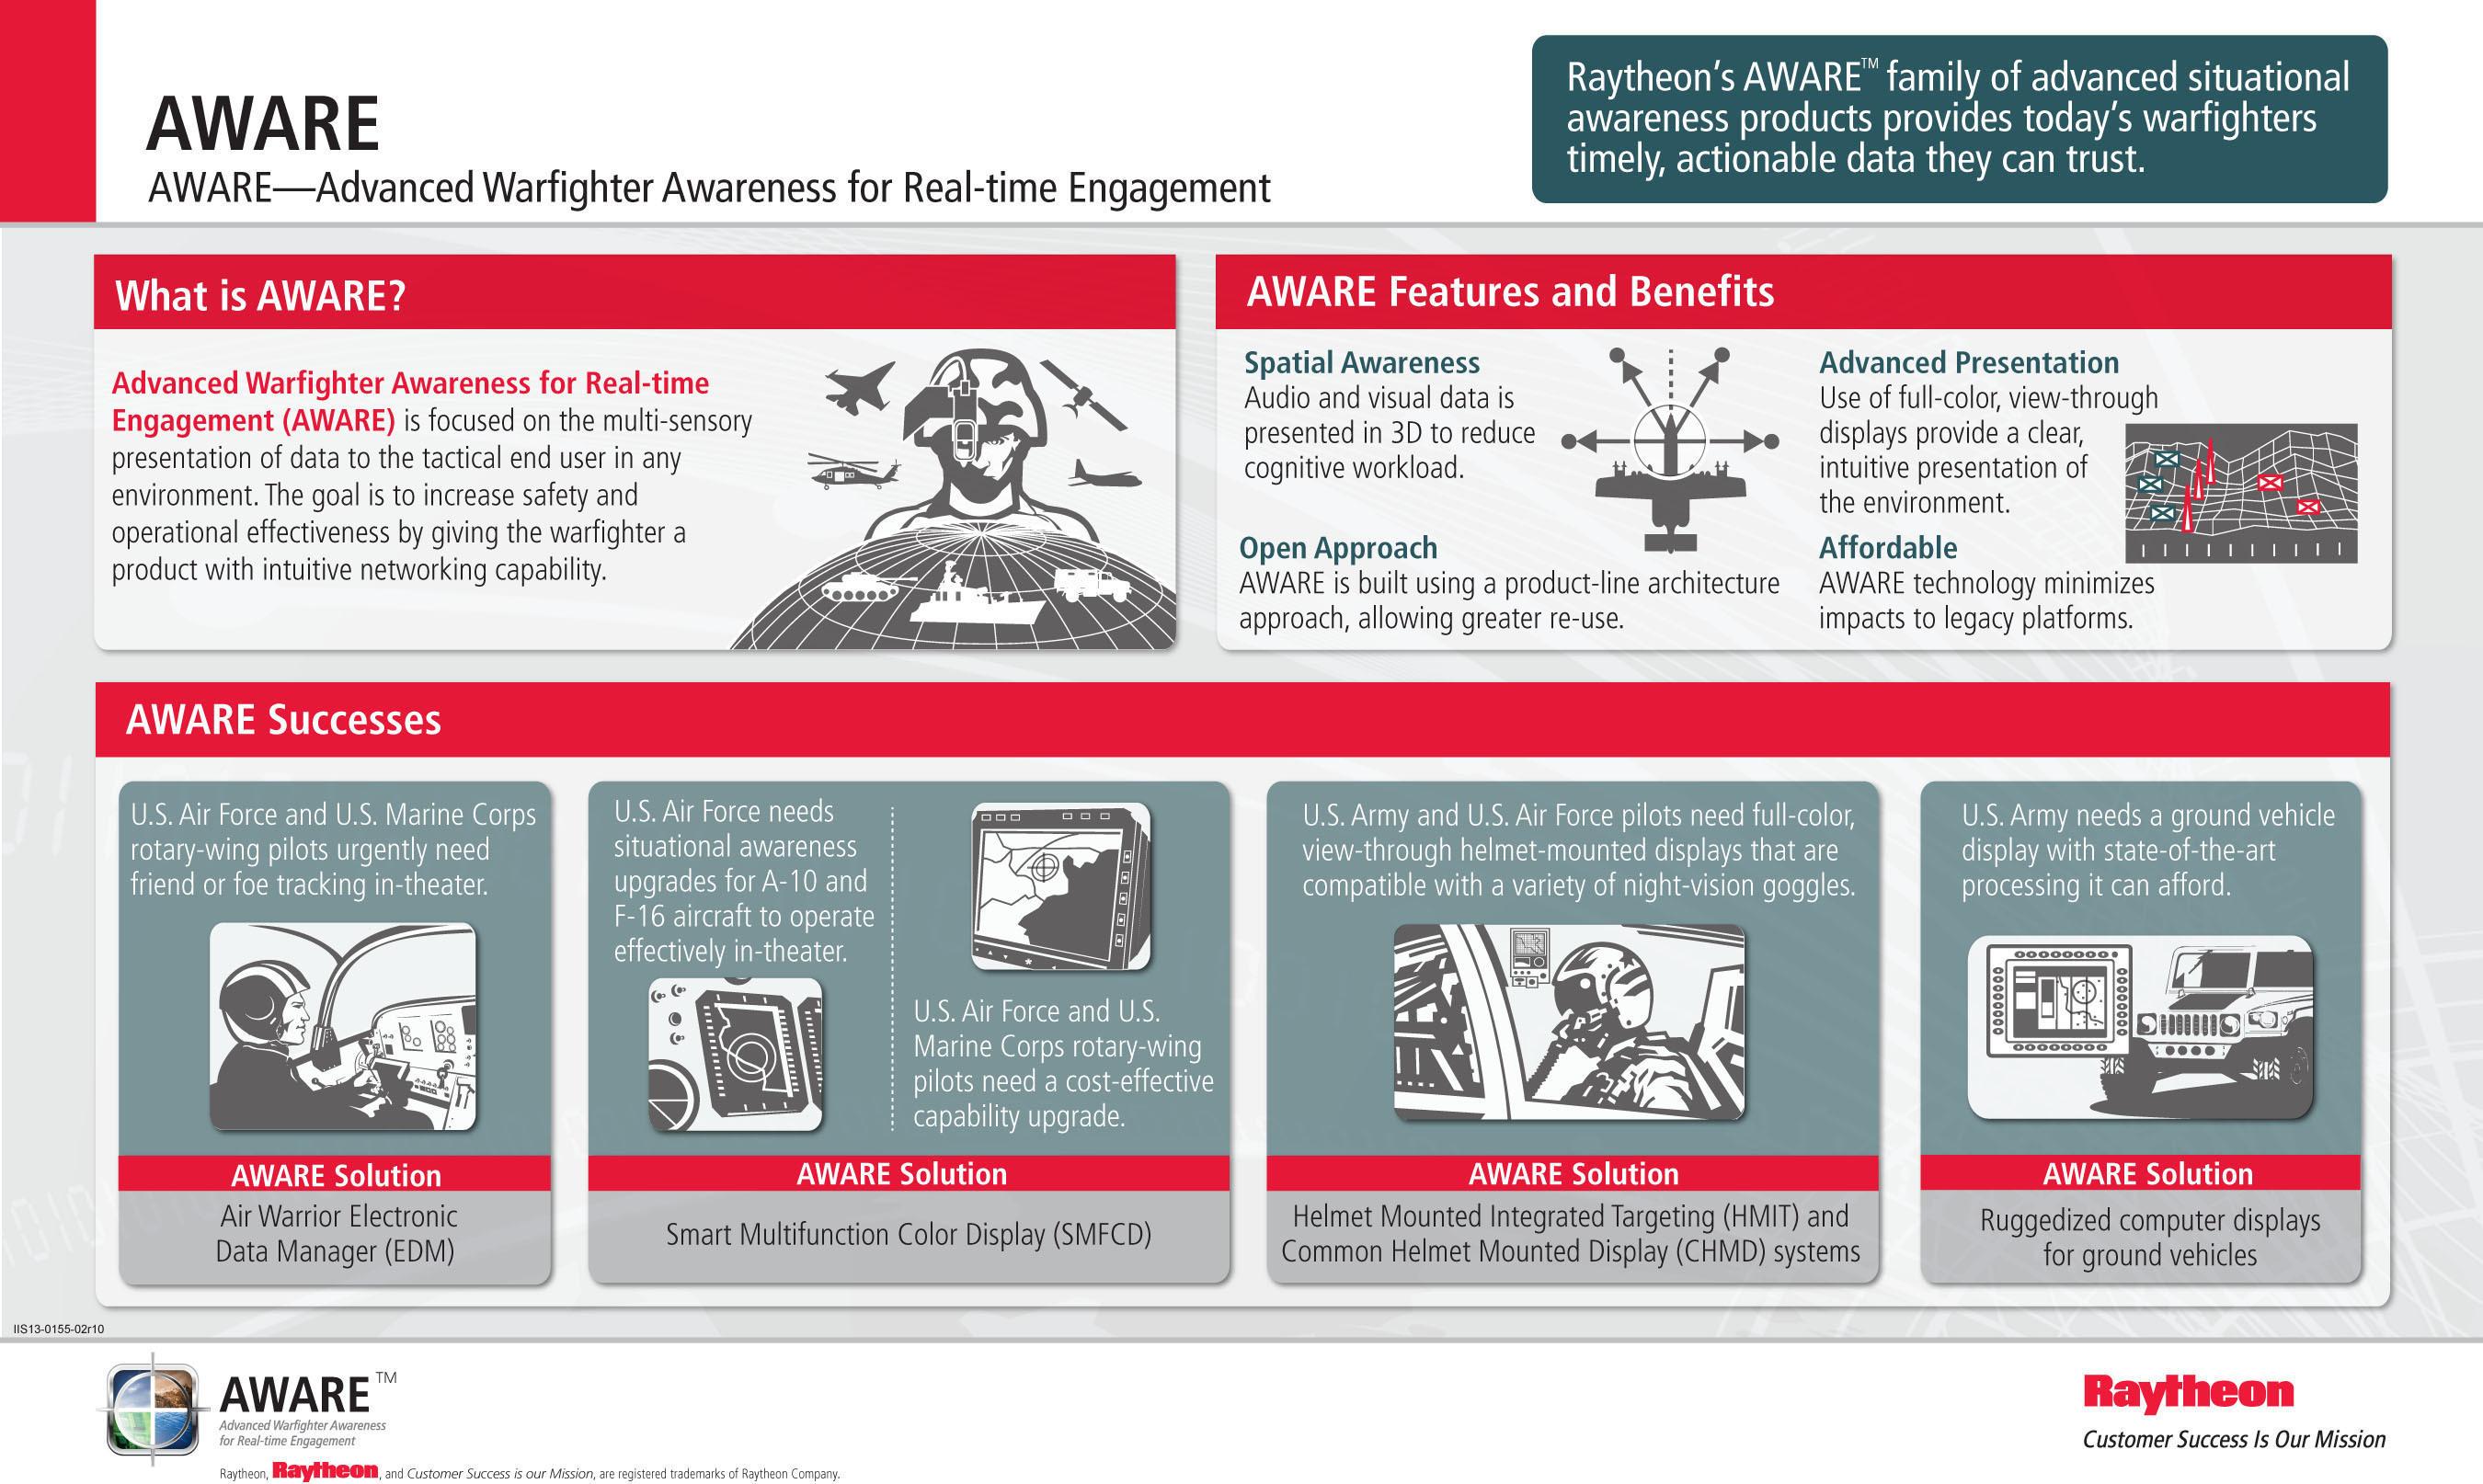 AWARE: Raytheon's Advanced Warfighter Awareness for Real-time Engagement advanced situational awareness ...